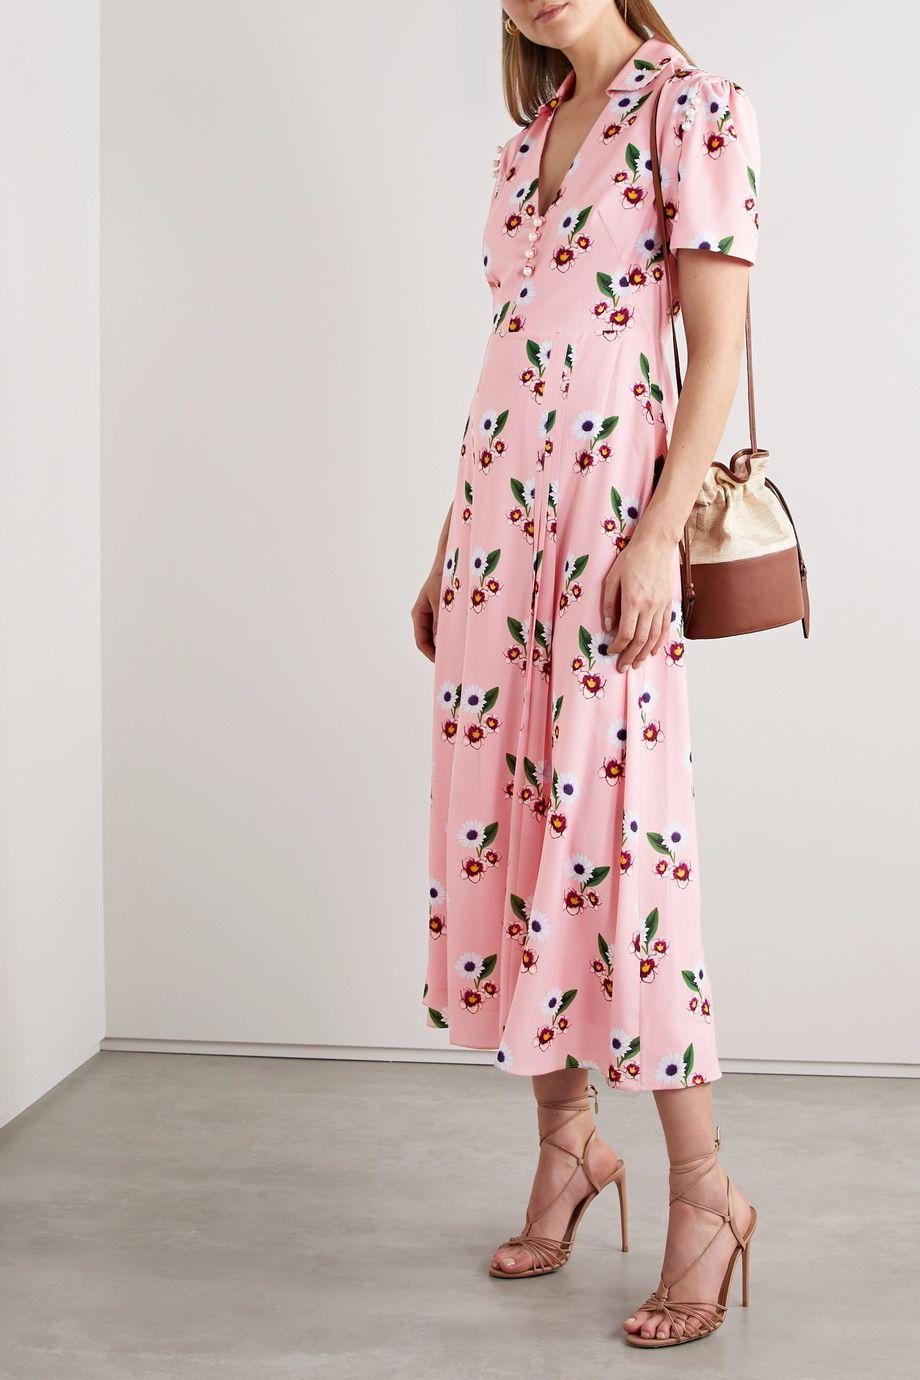 Borgo de Nor Adelaide floral-print crepe midi dress